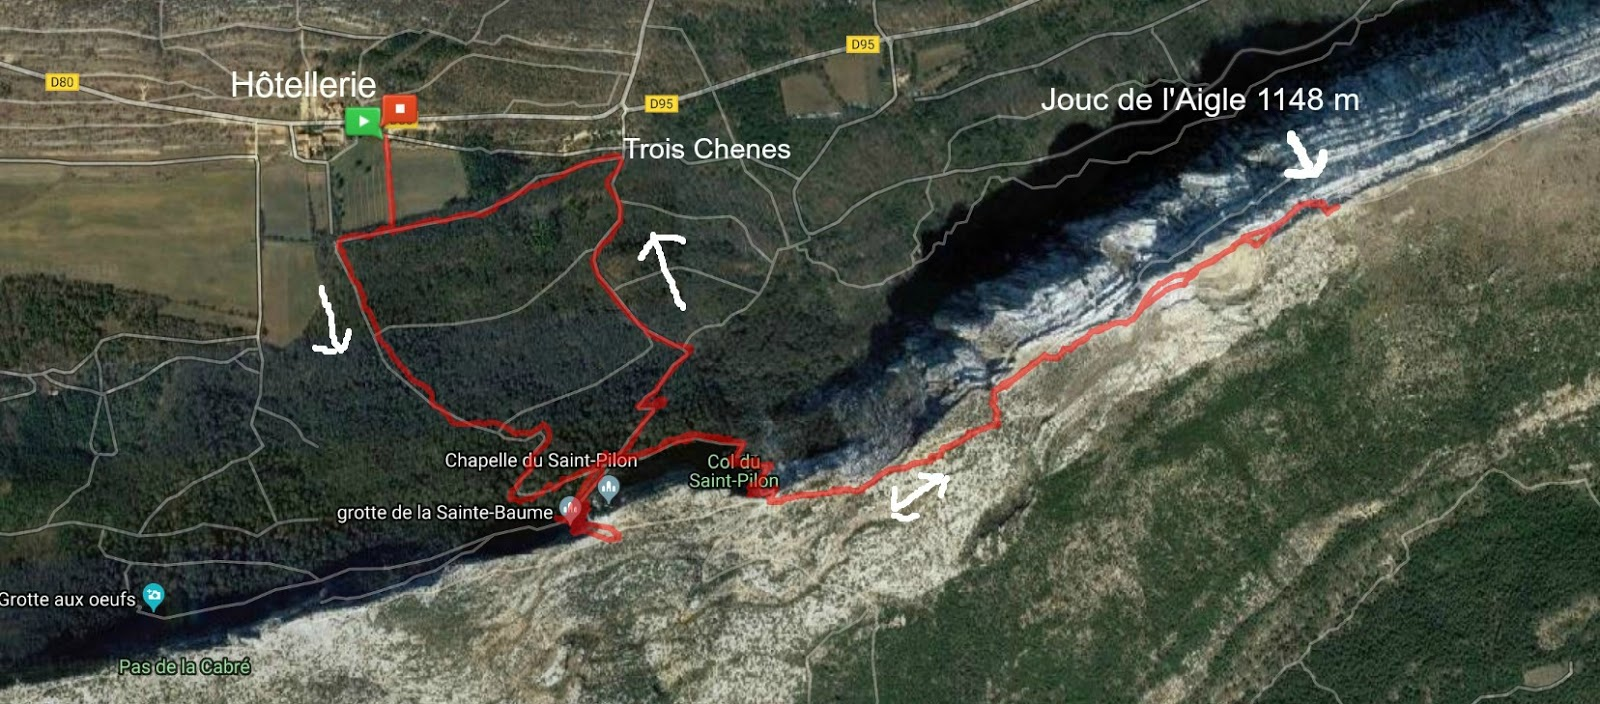 Hike trail to Jouc de l'Aigle Sainte Baume